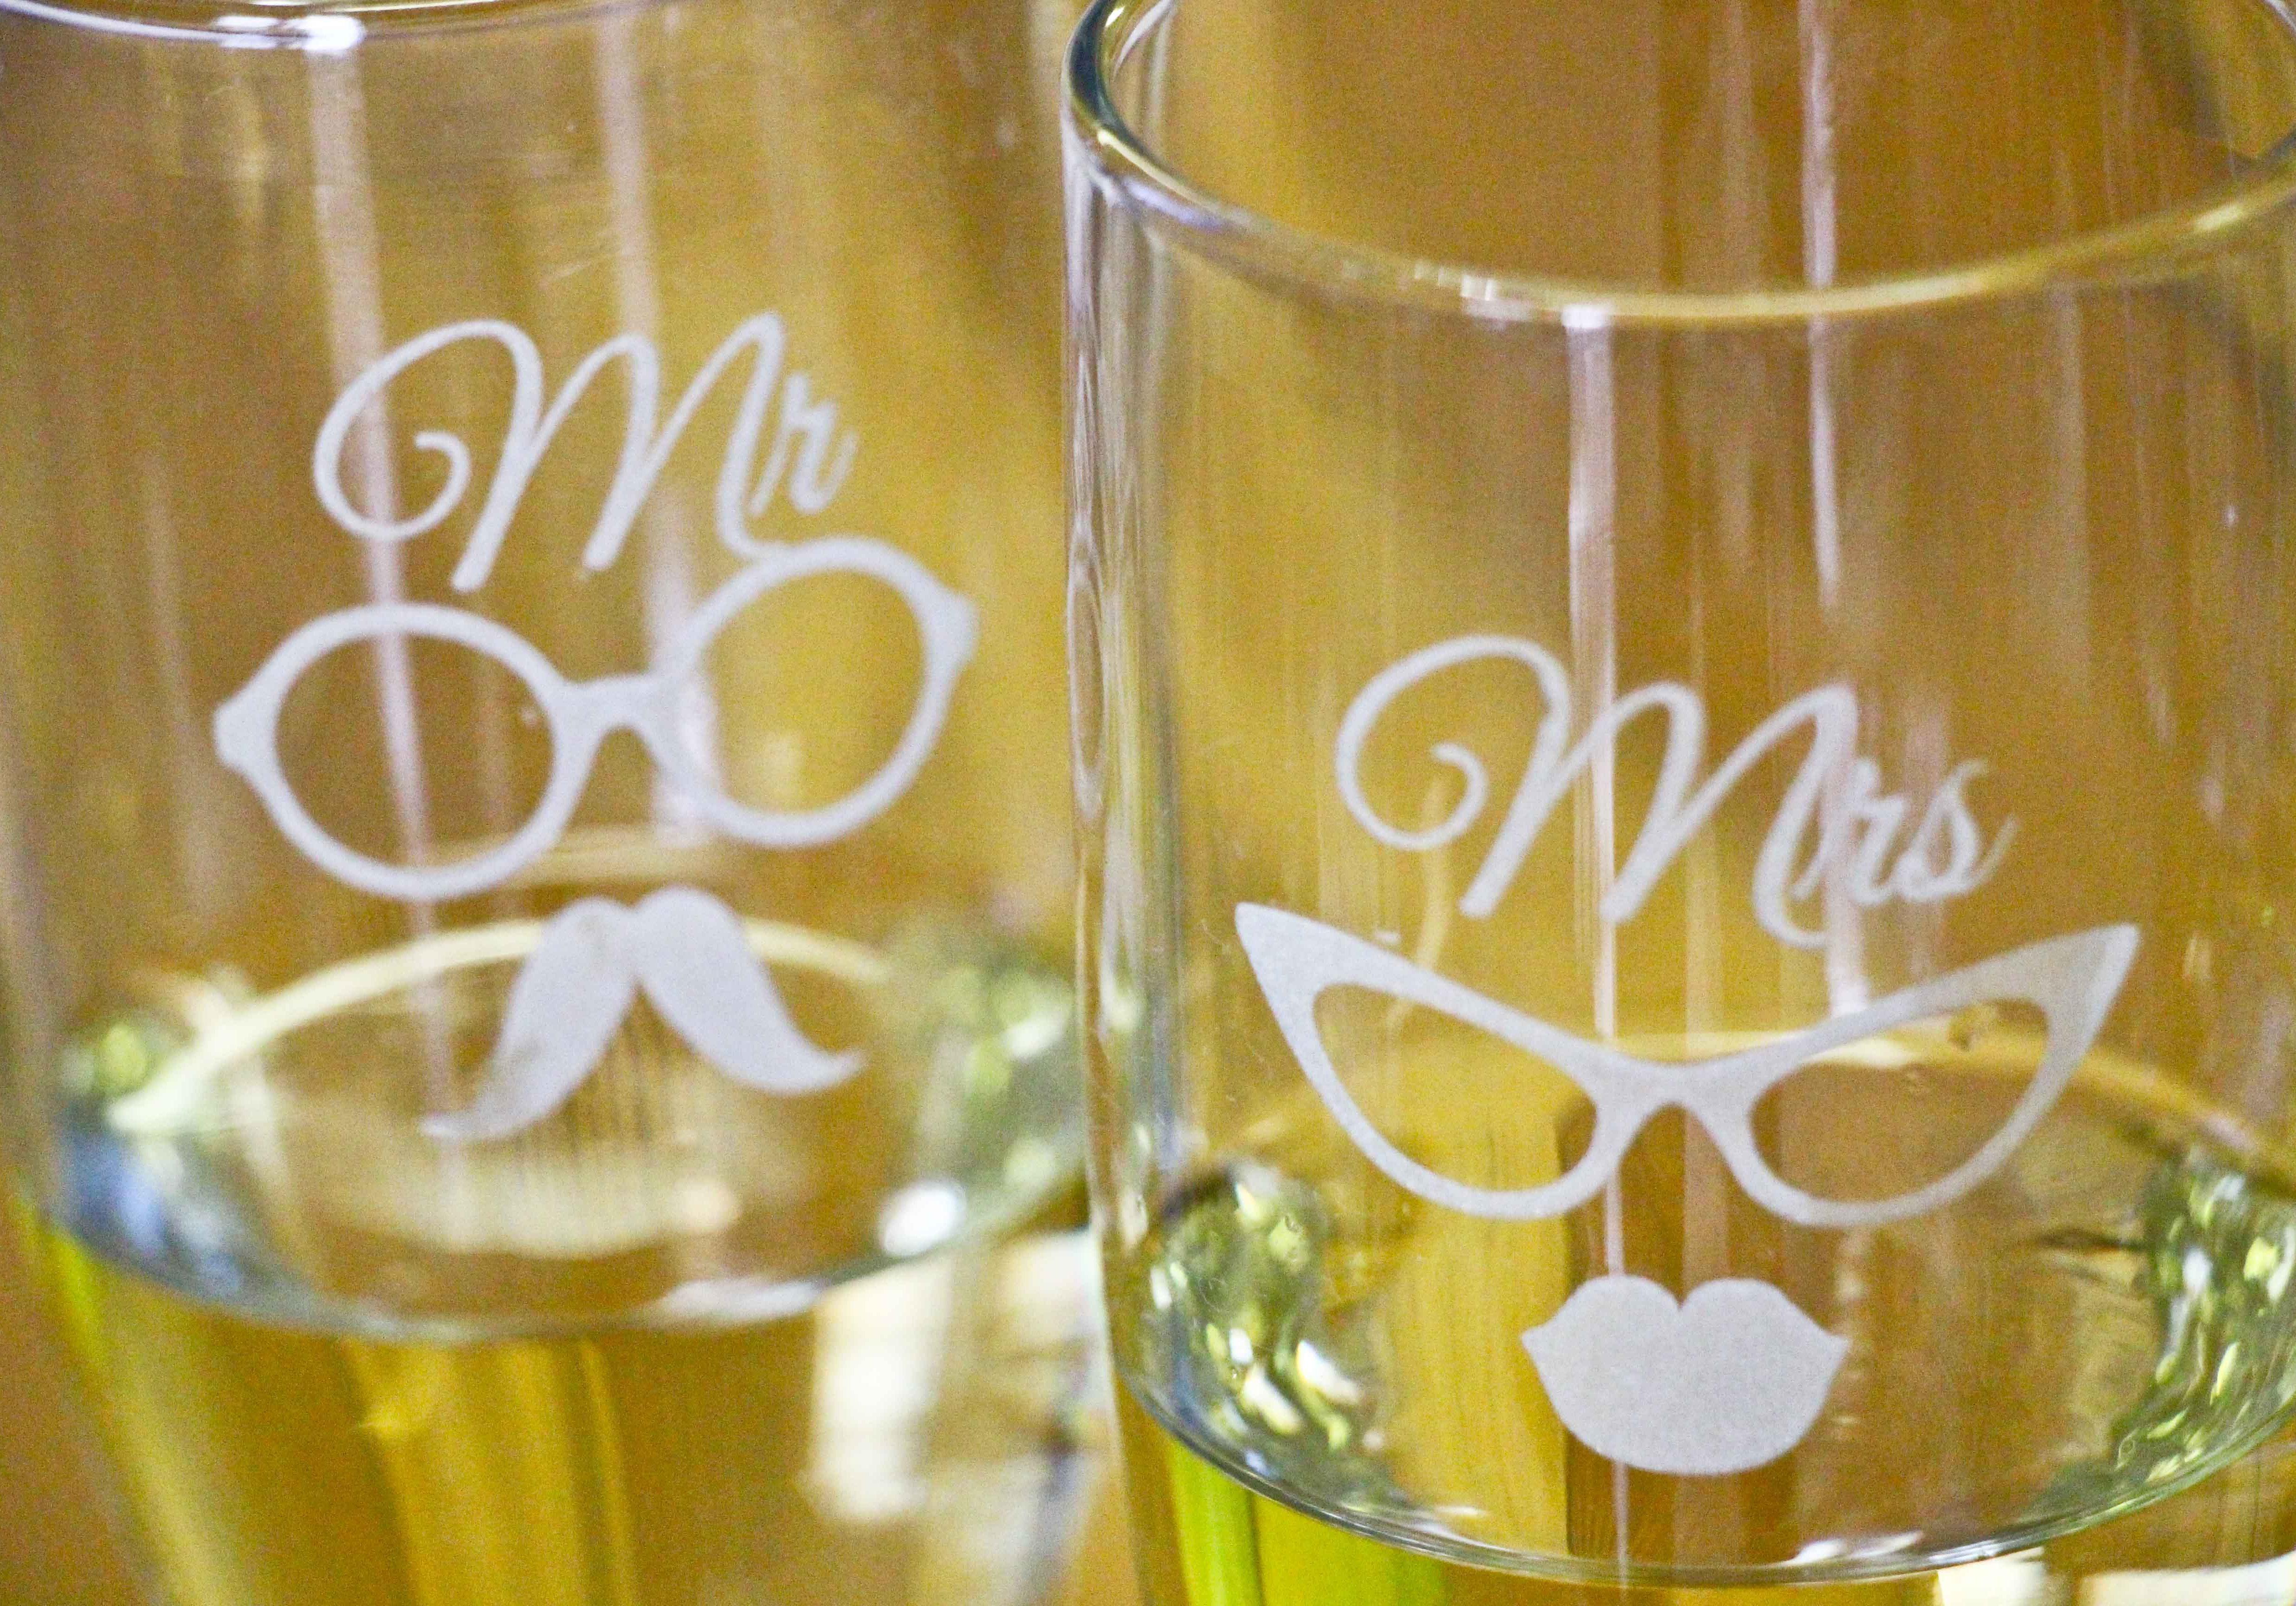 Laser Engraved Champagne Glasses